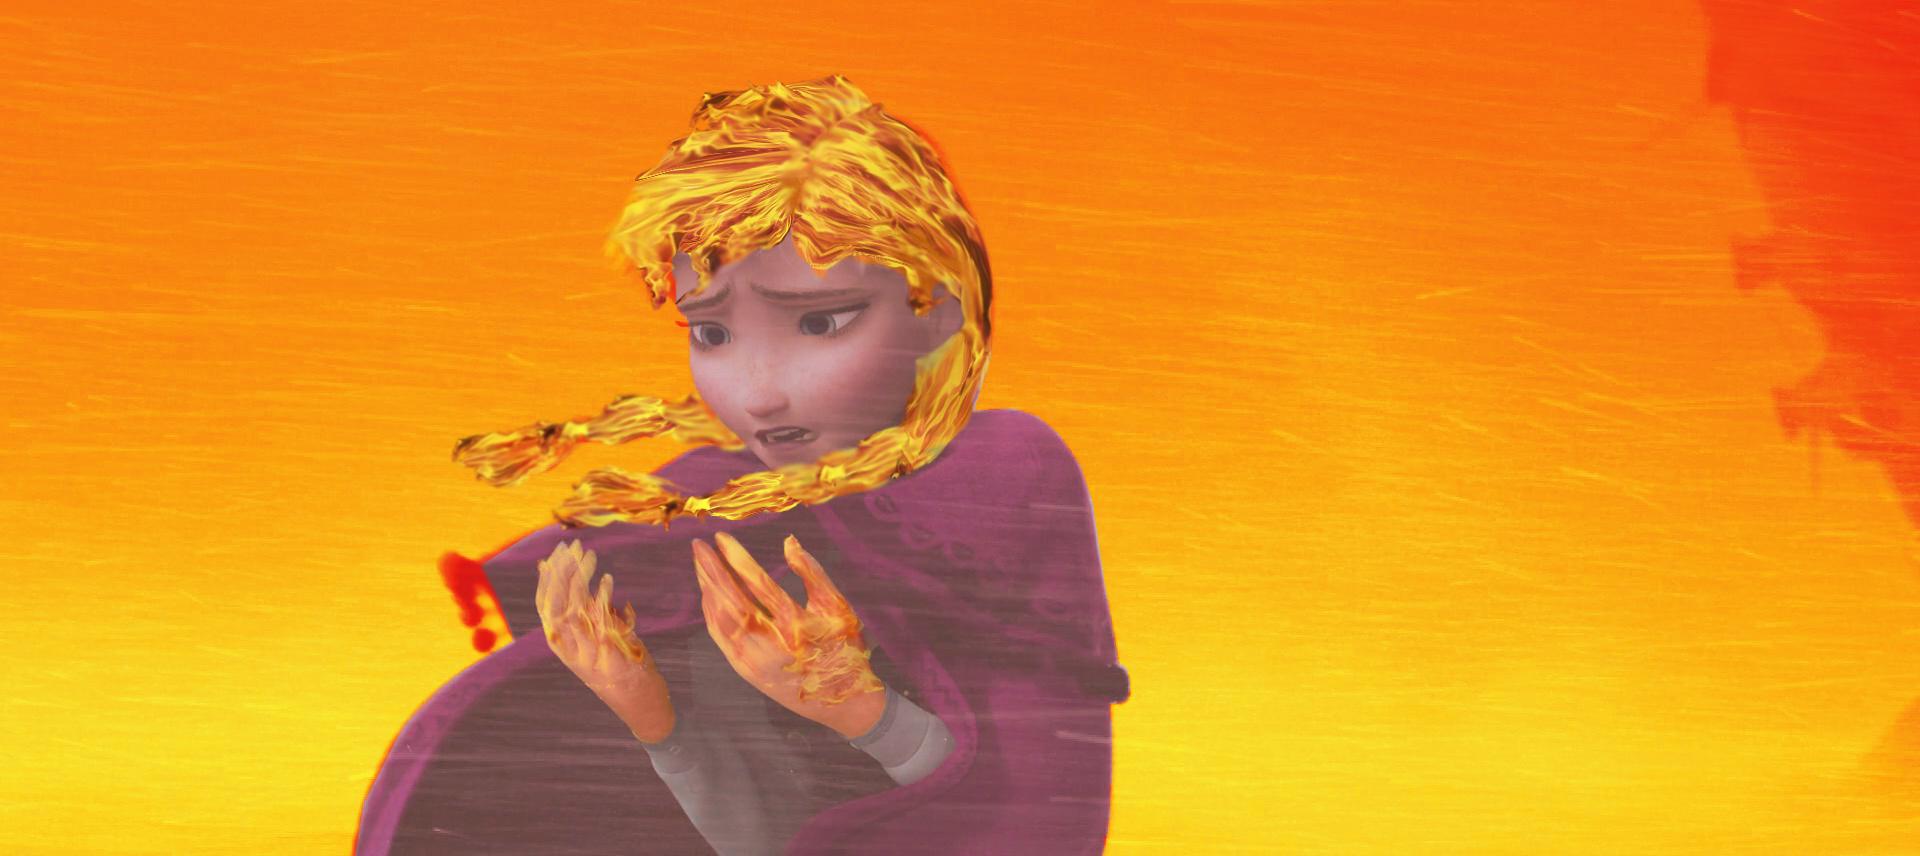 Fantasydreamtima Fire Elsa Anna Turning Into By